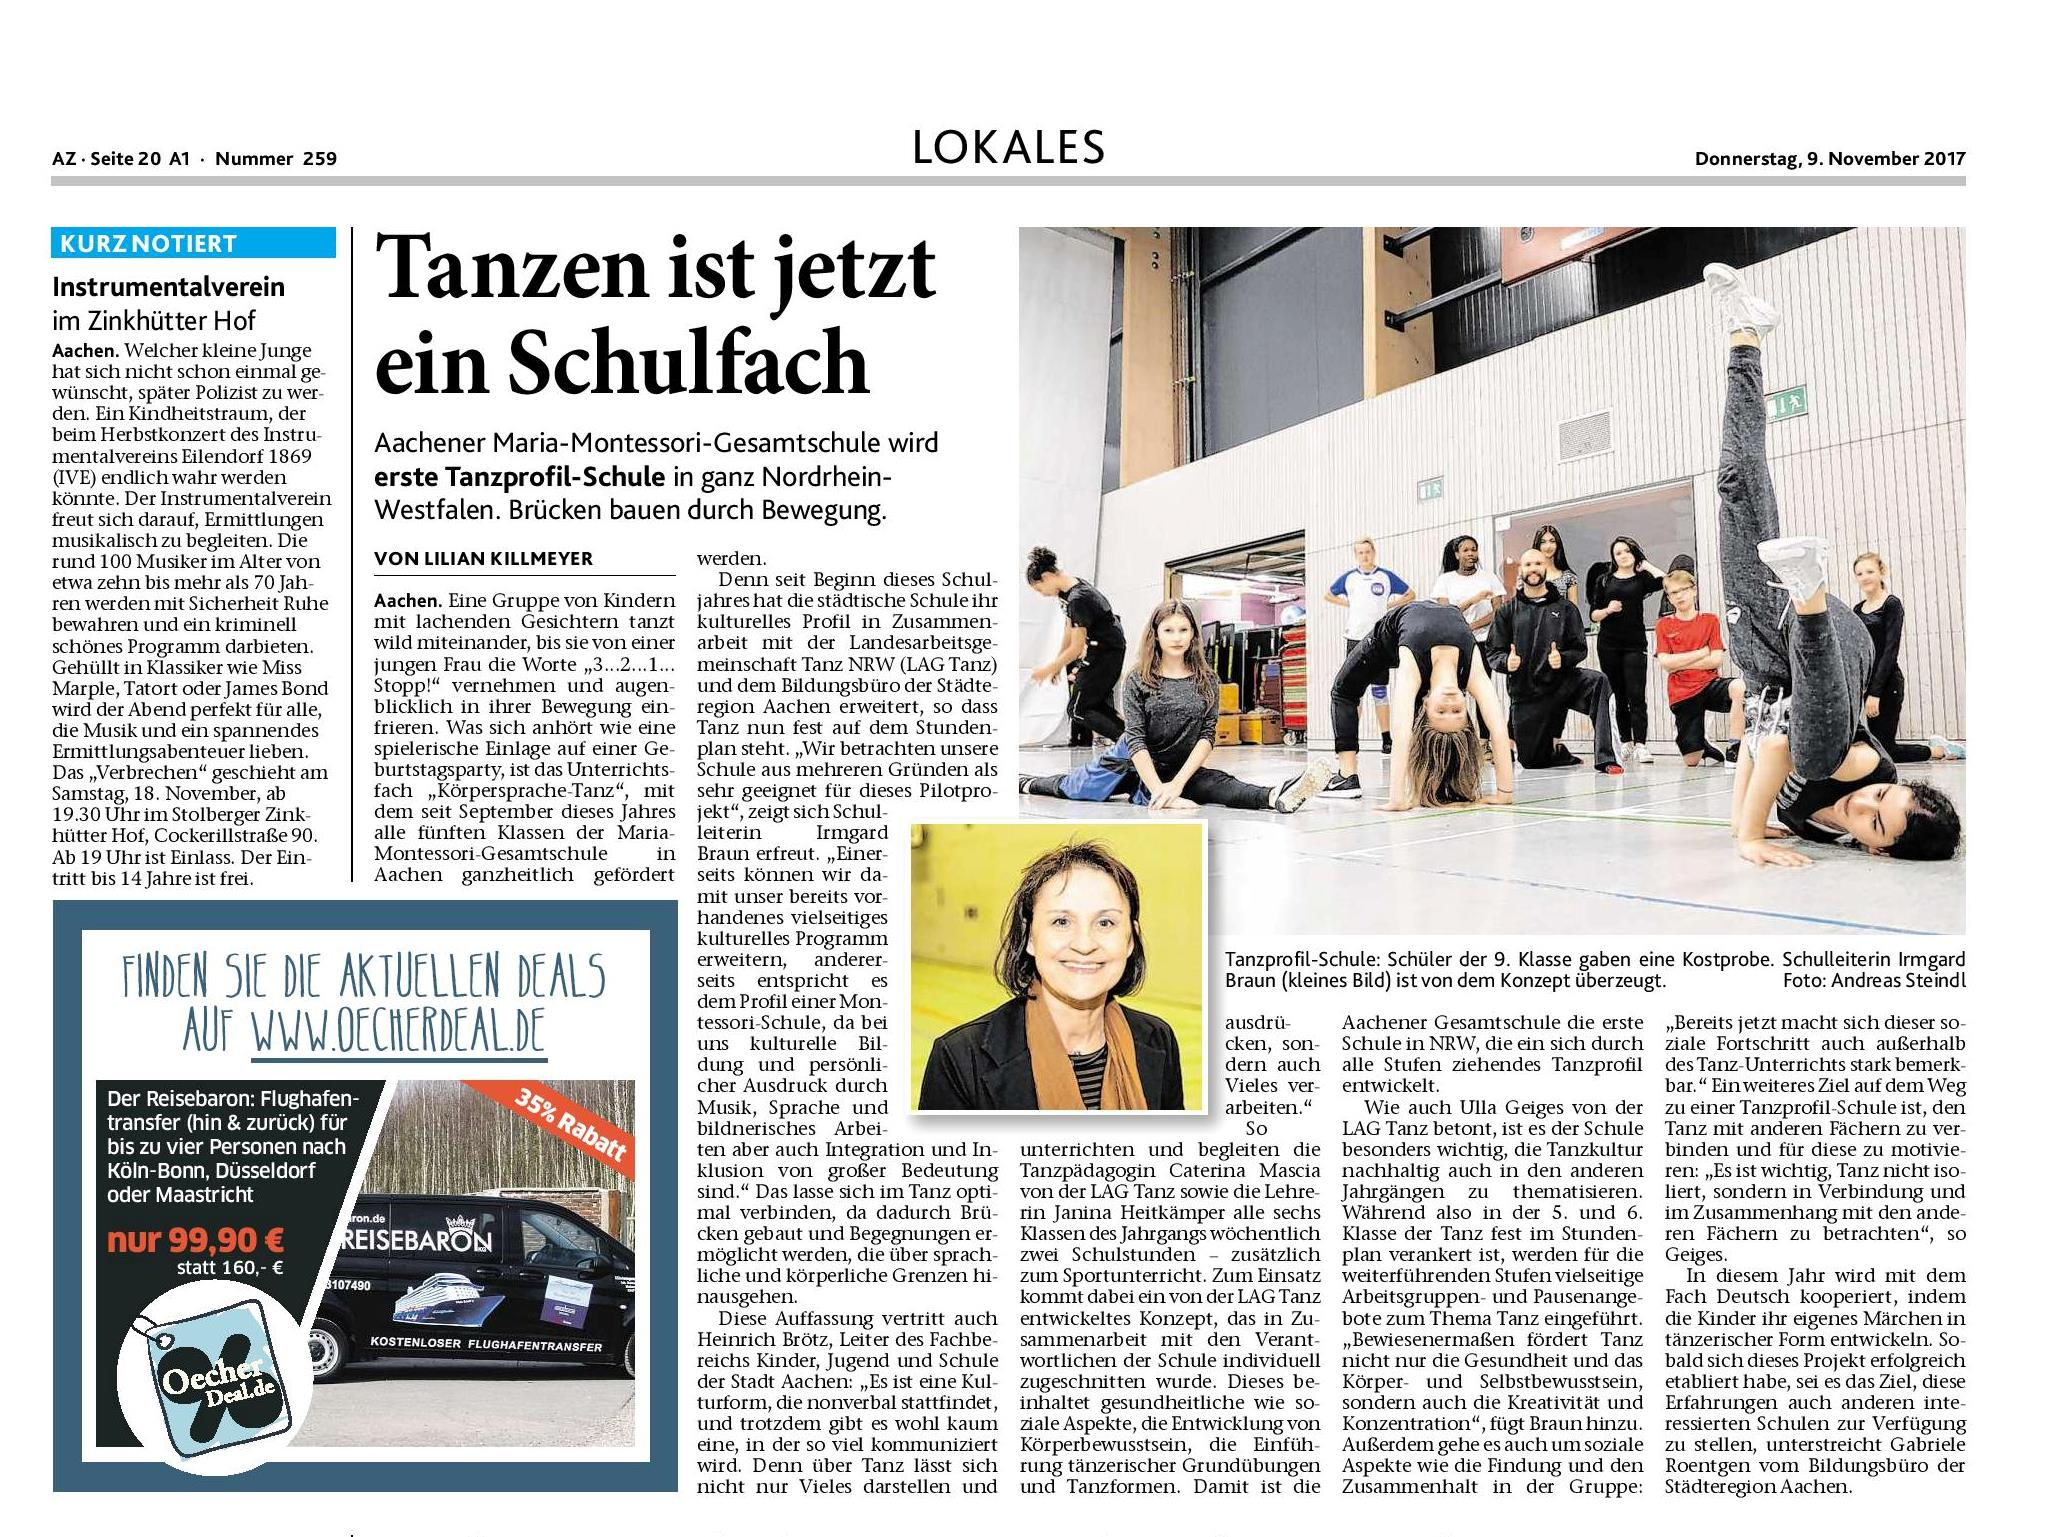 Erste Tanzprofil-Schule in NRW